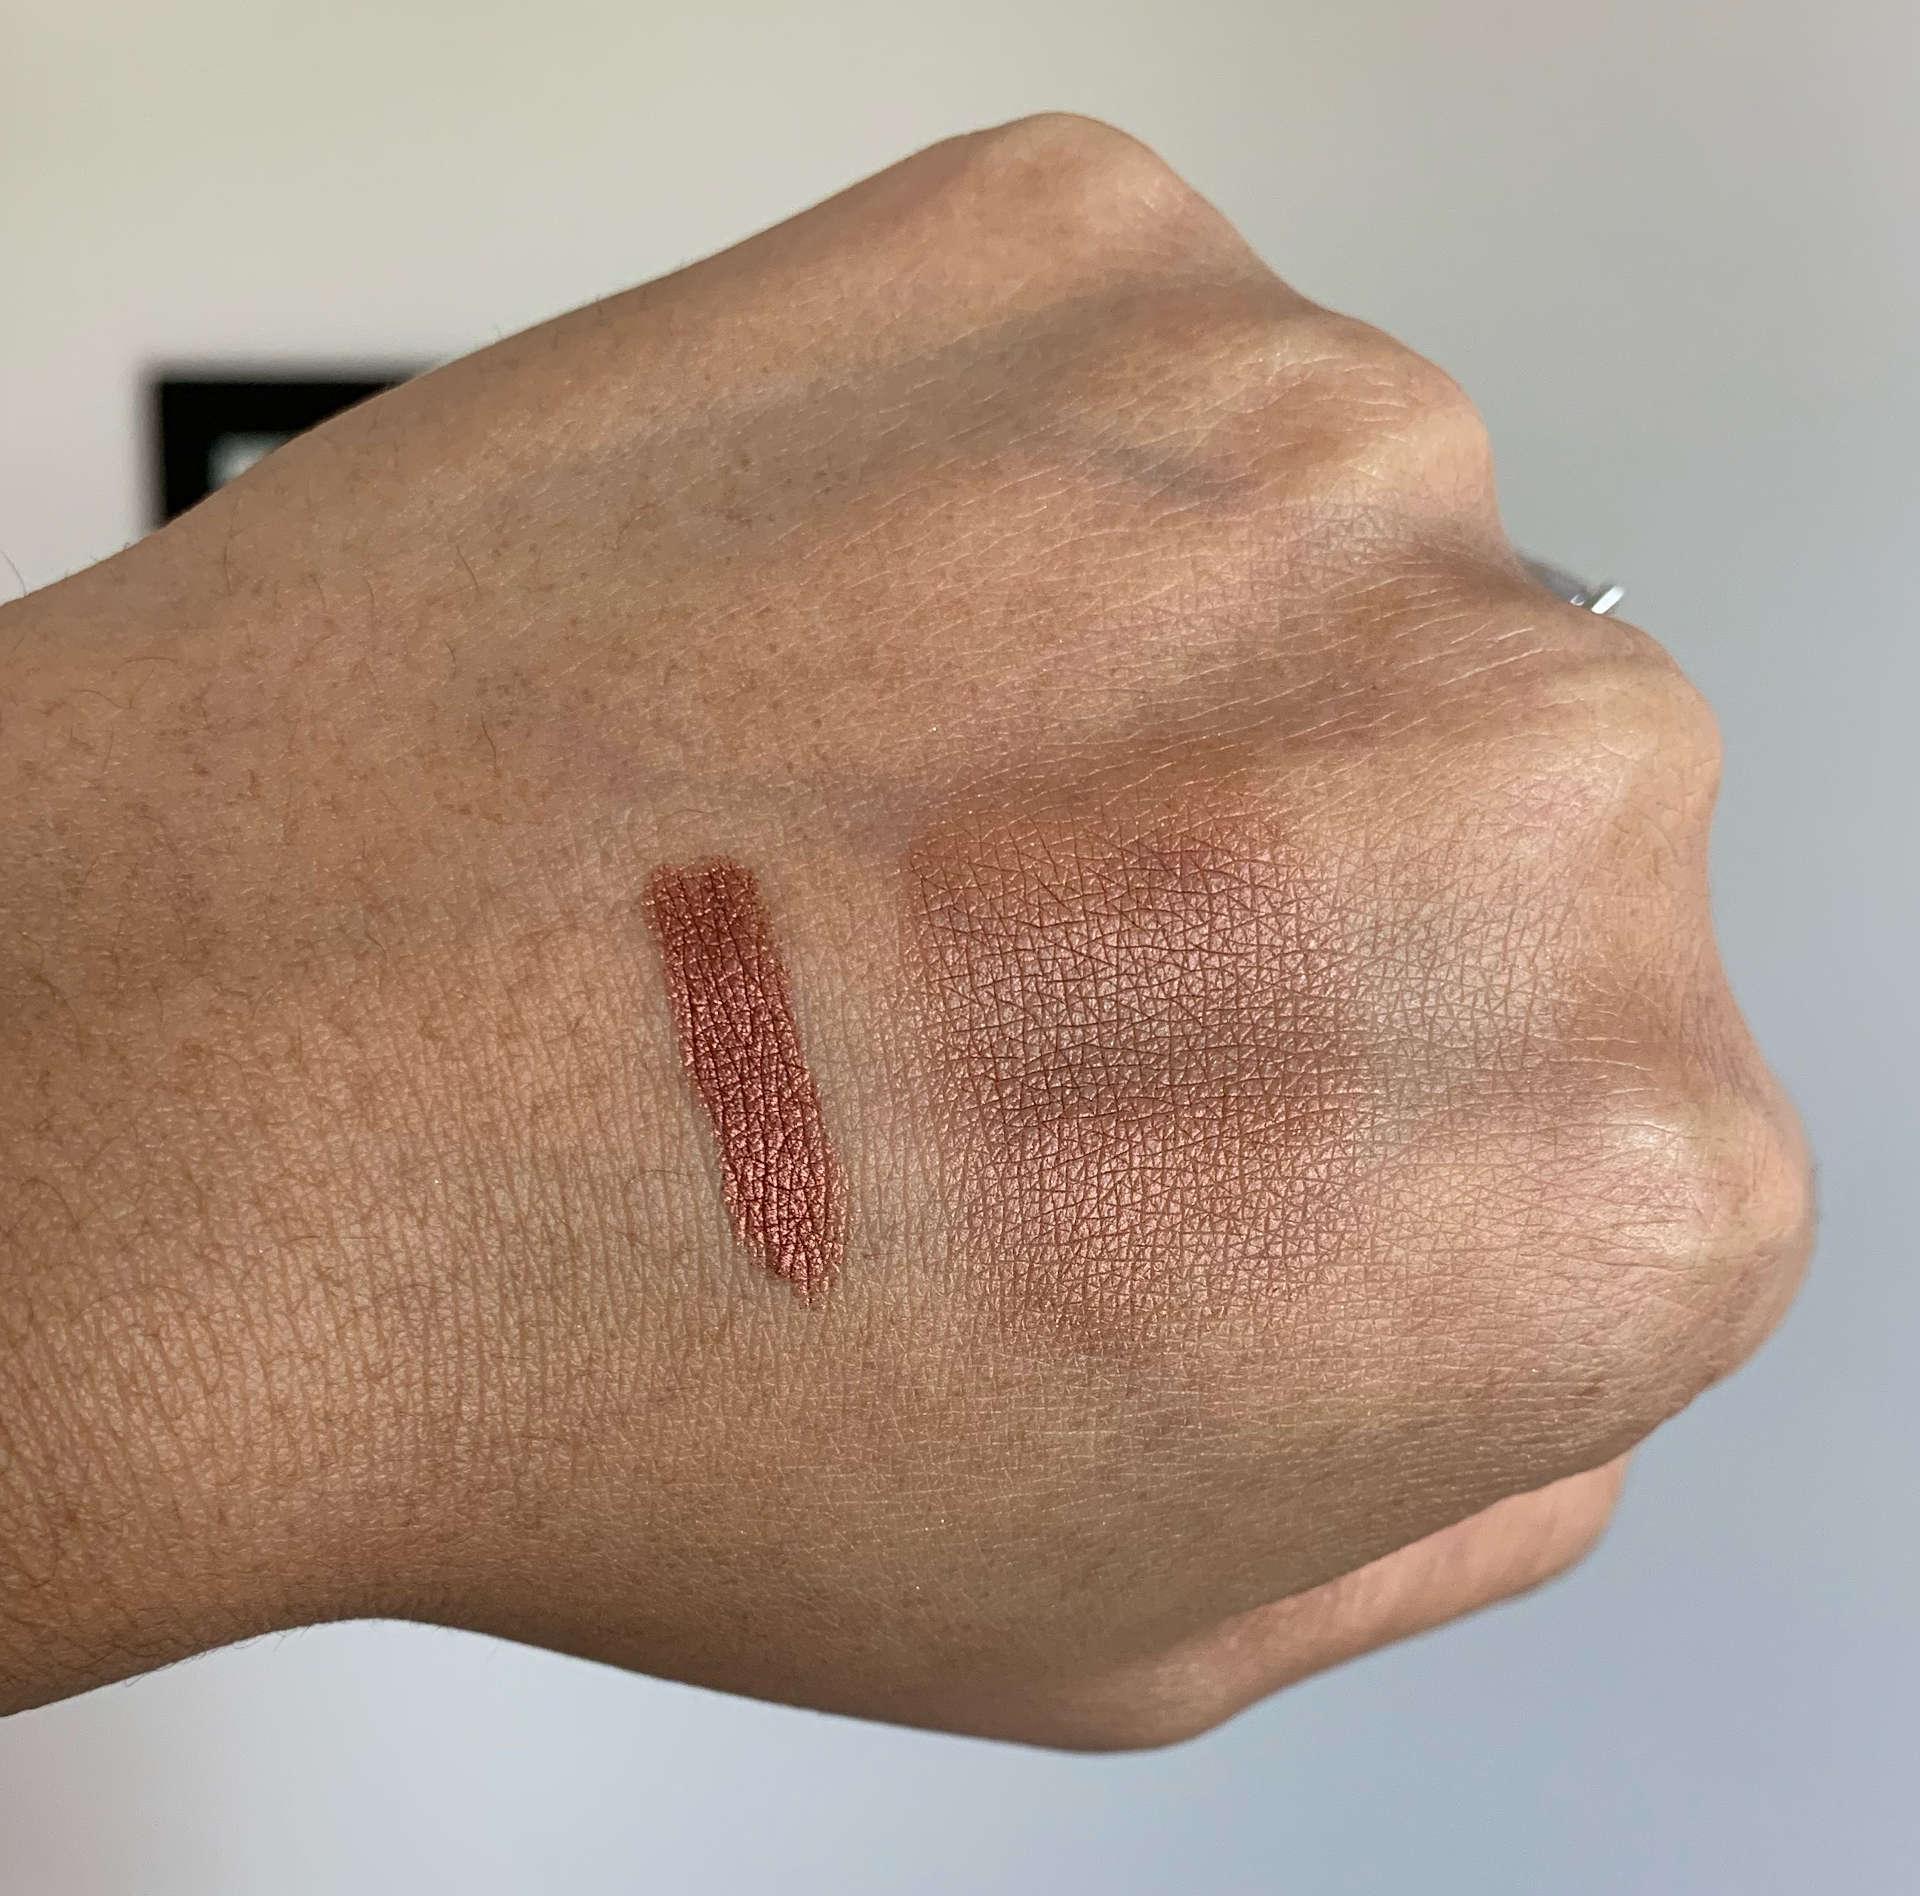 Laura Mercier RoseGlow Forbidden Rose Caviar Stick Eye Color/Eyeshadow Medium Dark Skin Swatch